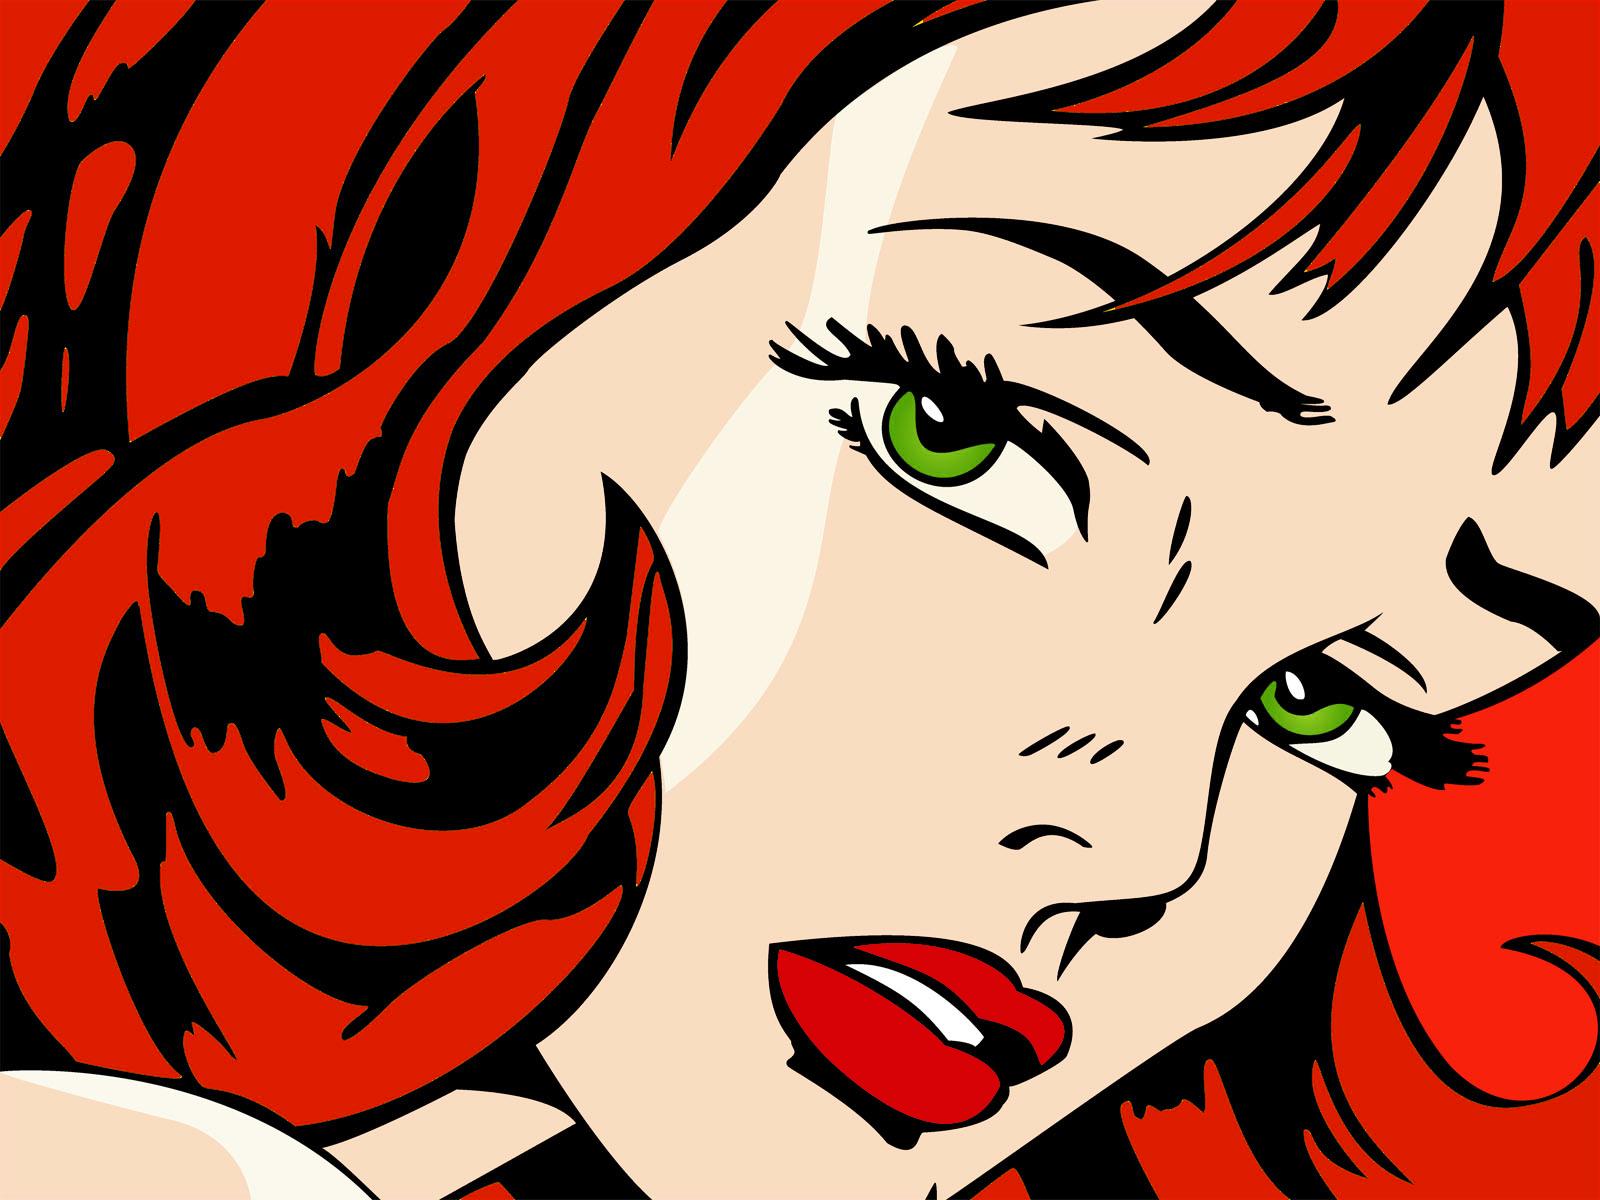 Pin By Sebastian Brinkerhoff On Art Pop Art Face Pop Art Pop Art Comic